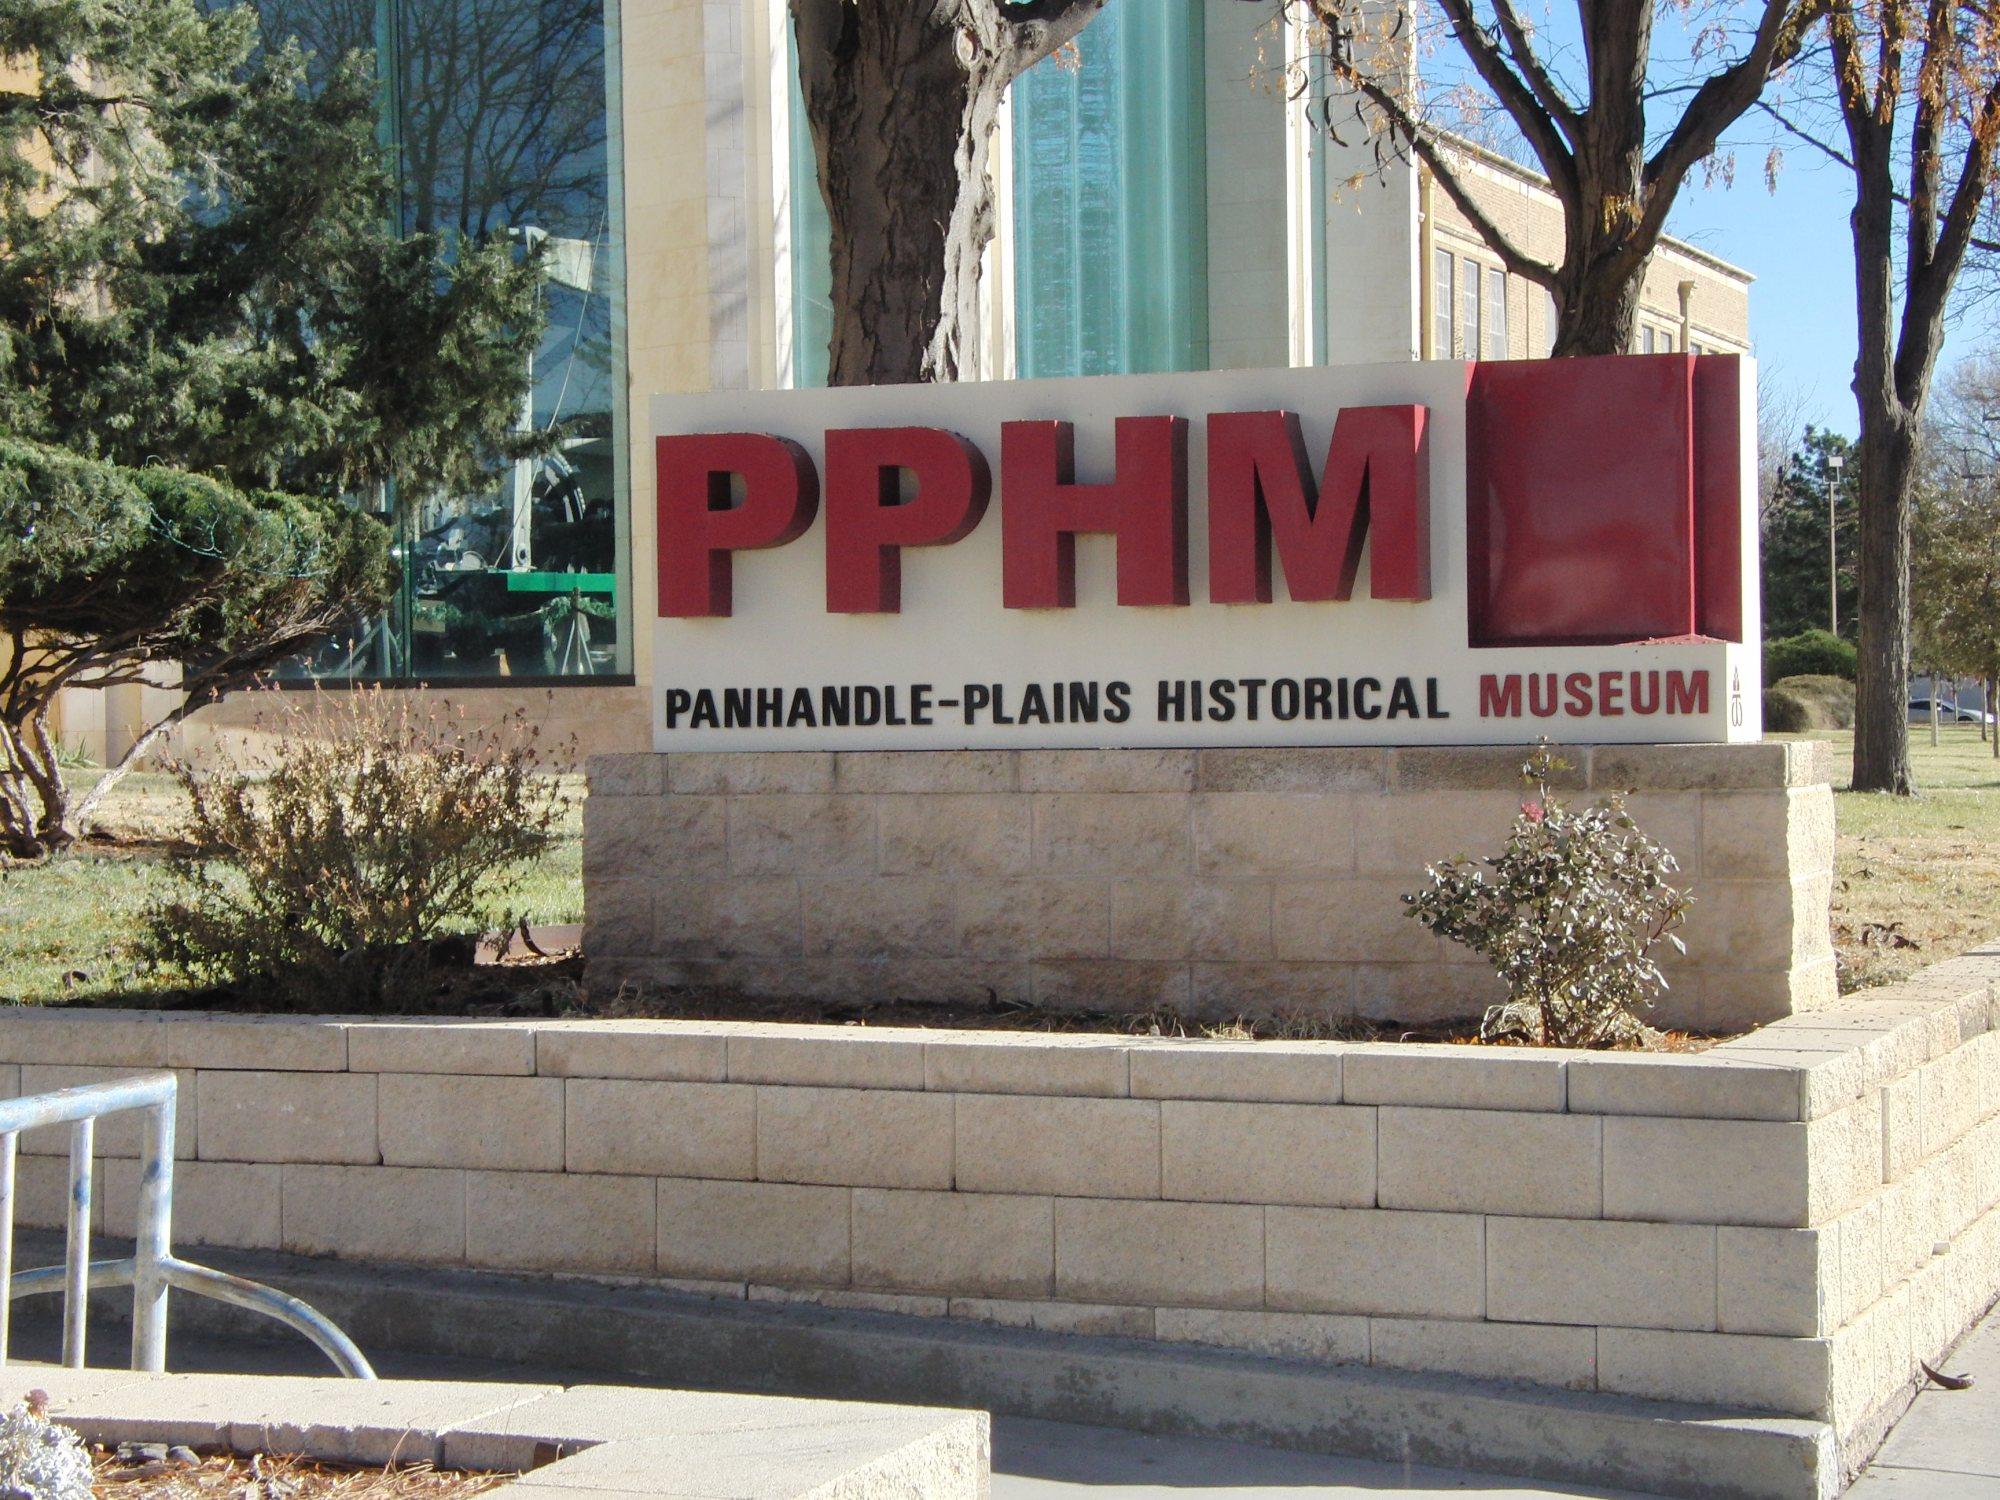 PANHANDLE-PLAINS HISTORICAL MUSEUM_1494019727021.jpg